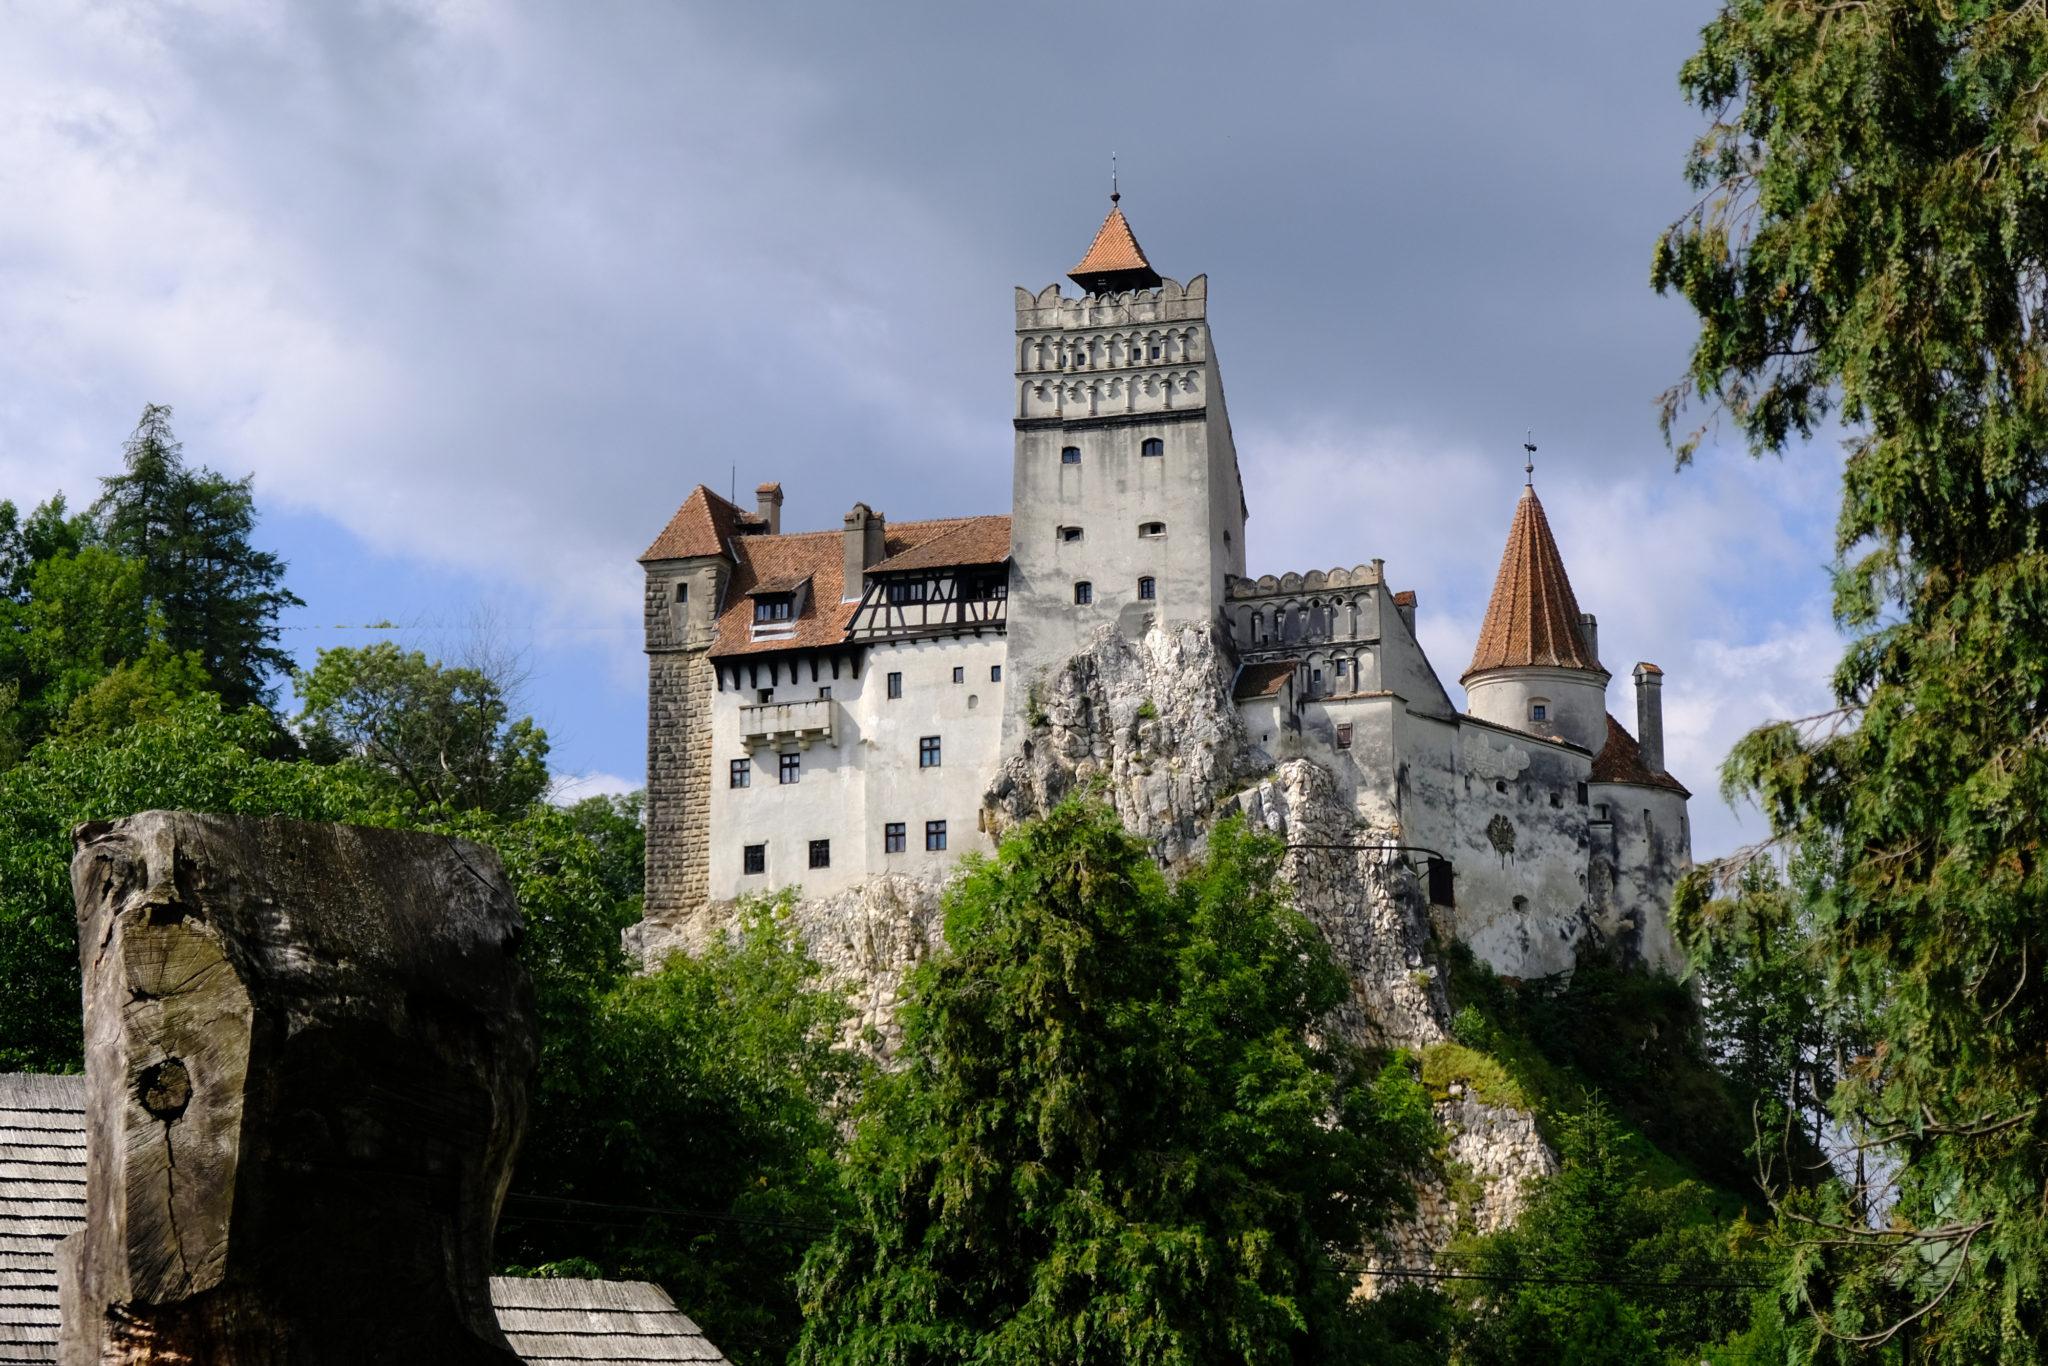 Rumunia, Transylwania - Zamek Drakuli w Bran